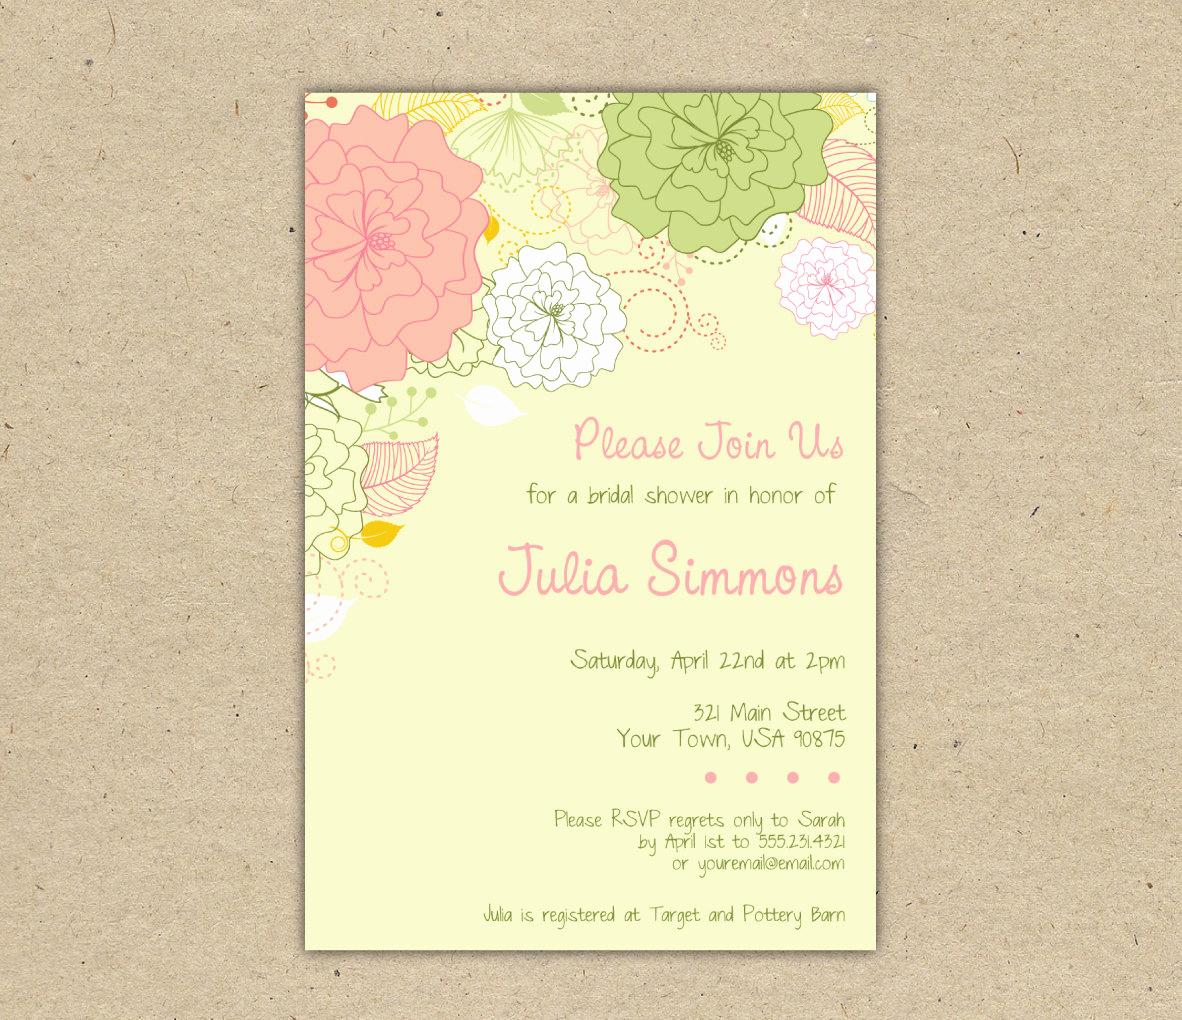 Printable Bridal Shower Invitation Templates Awesome Rustic Bridal Shower Invitation Templates